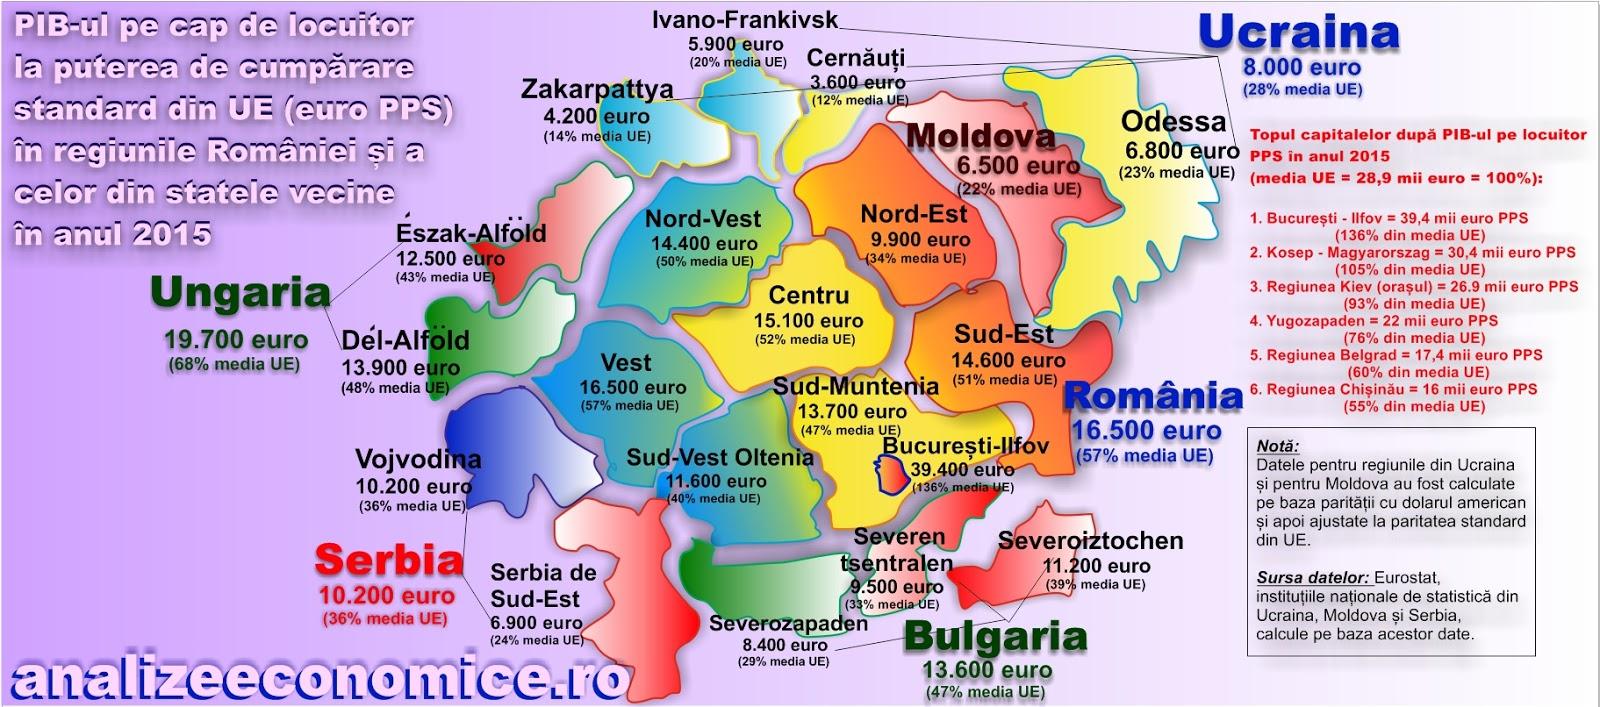 Situatia Economica A Romaniei Vs Vecini Romania Military